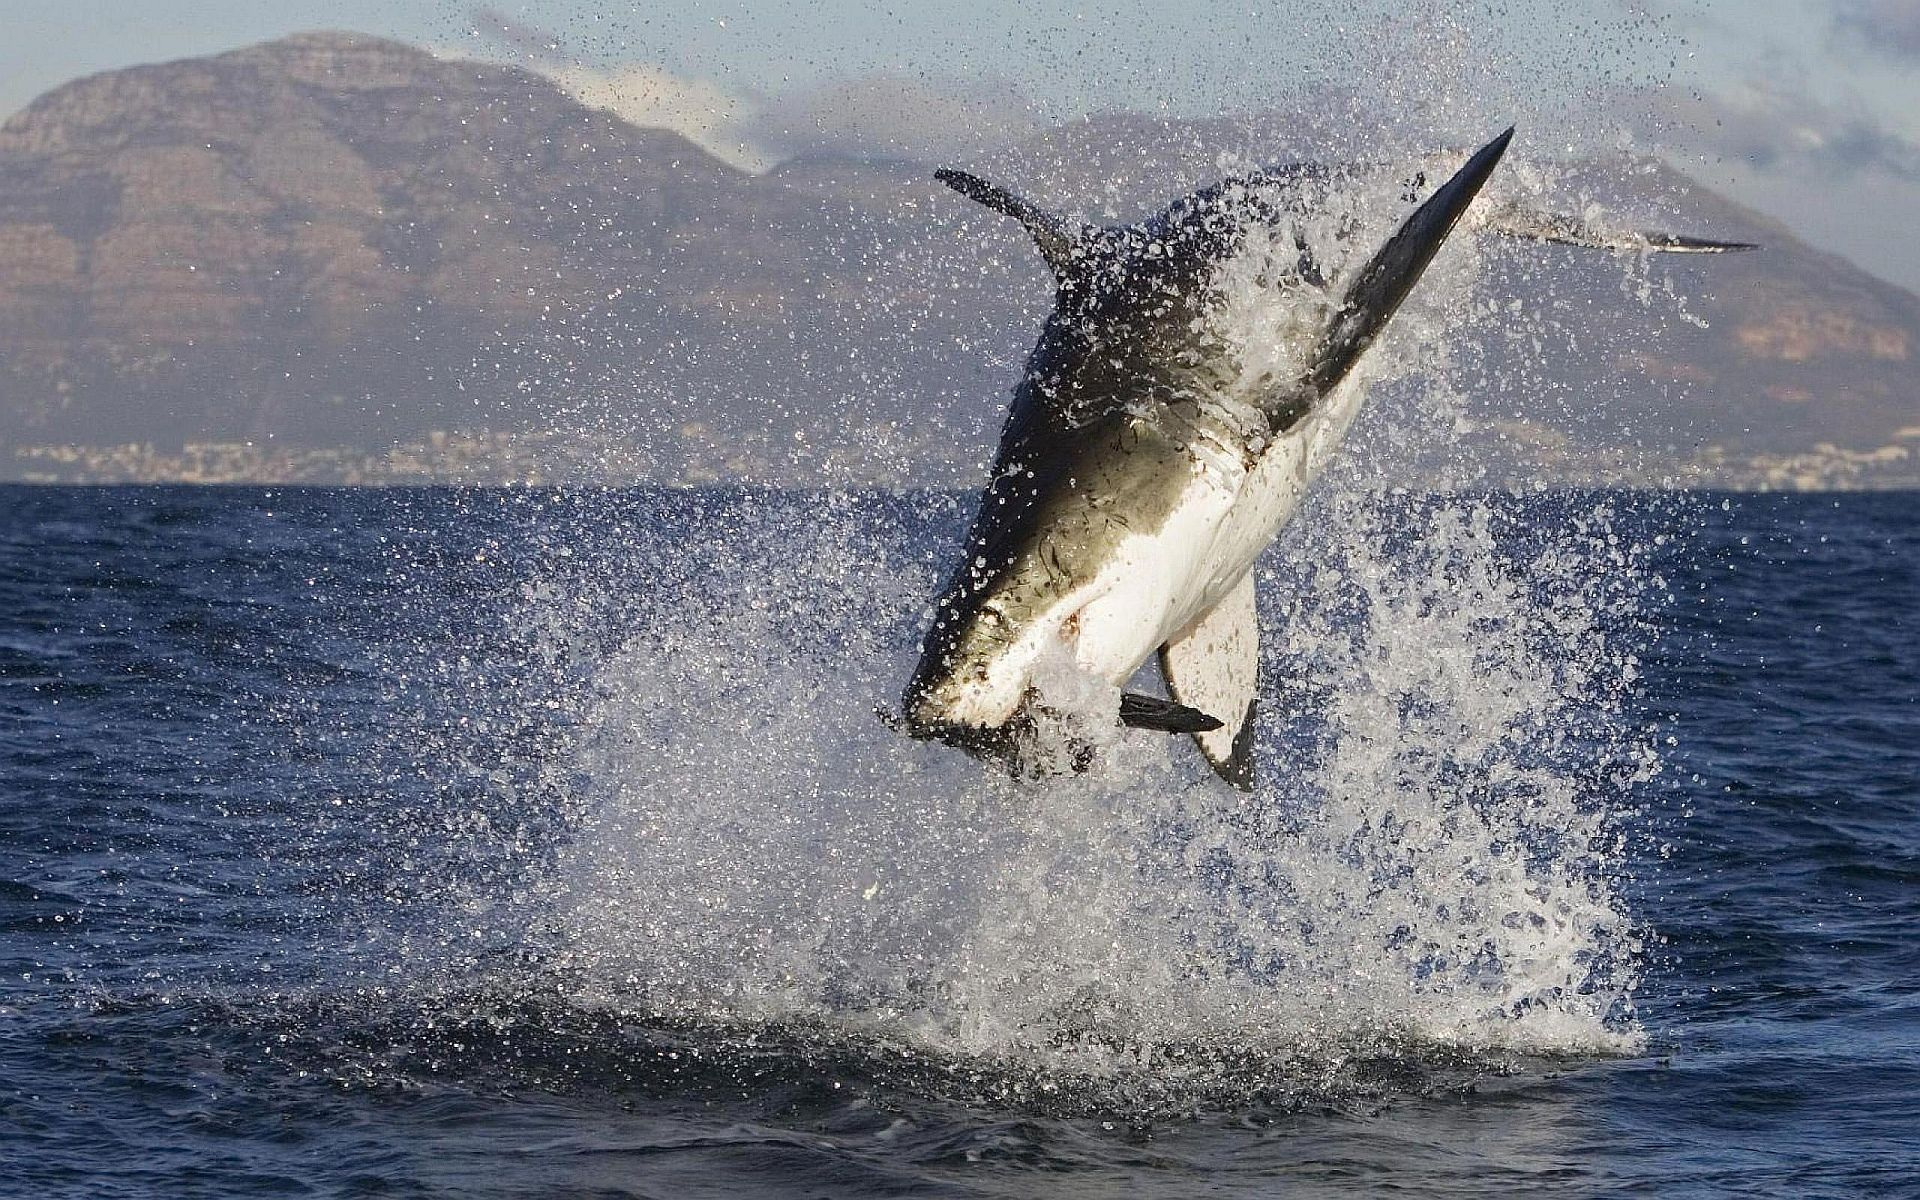 Ultra Hd White Shark Attack